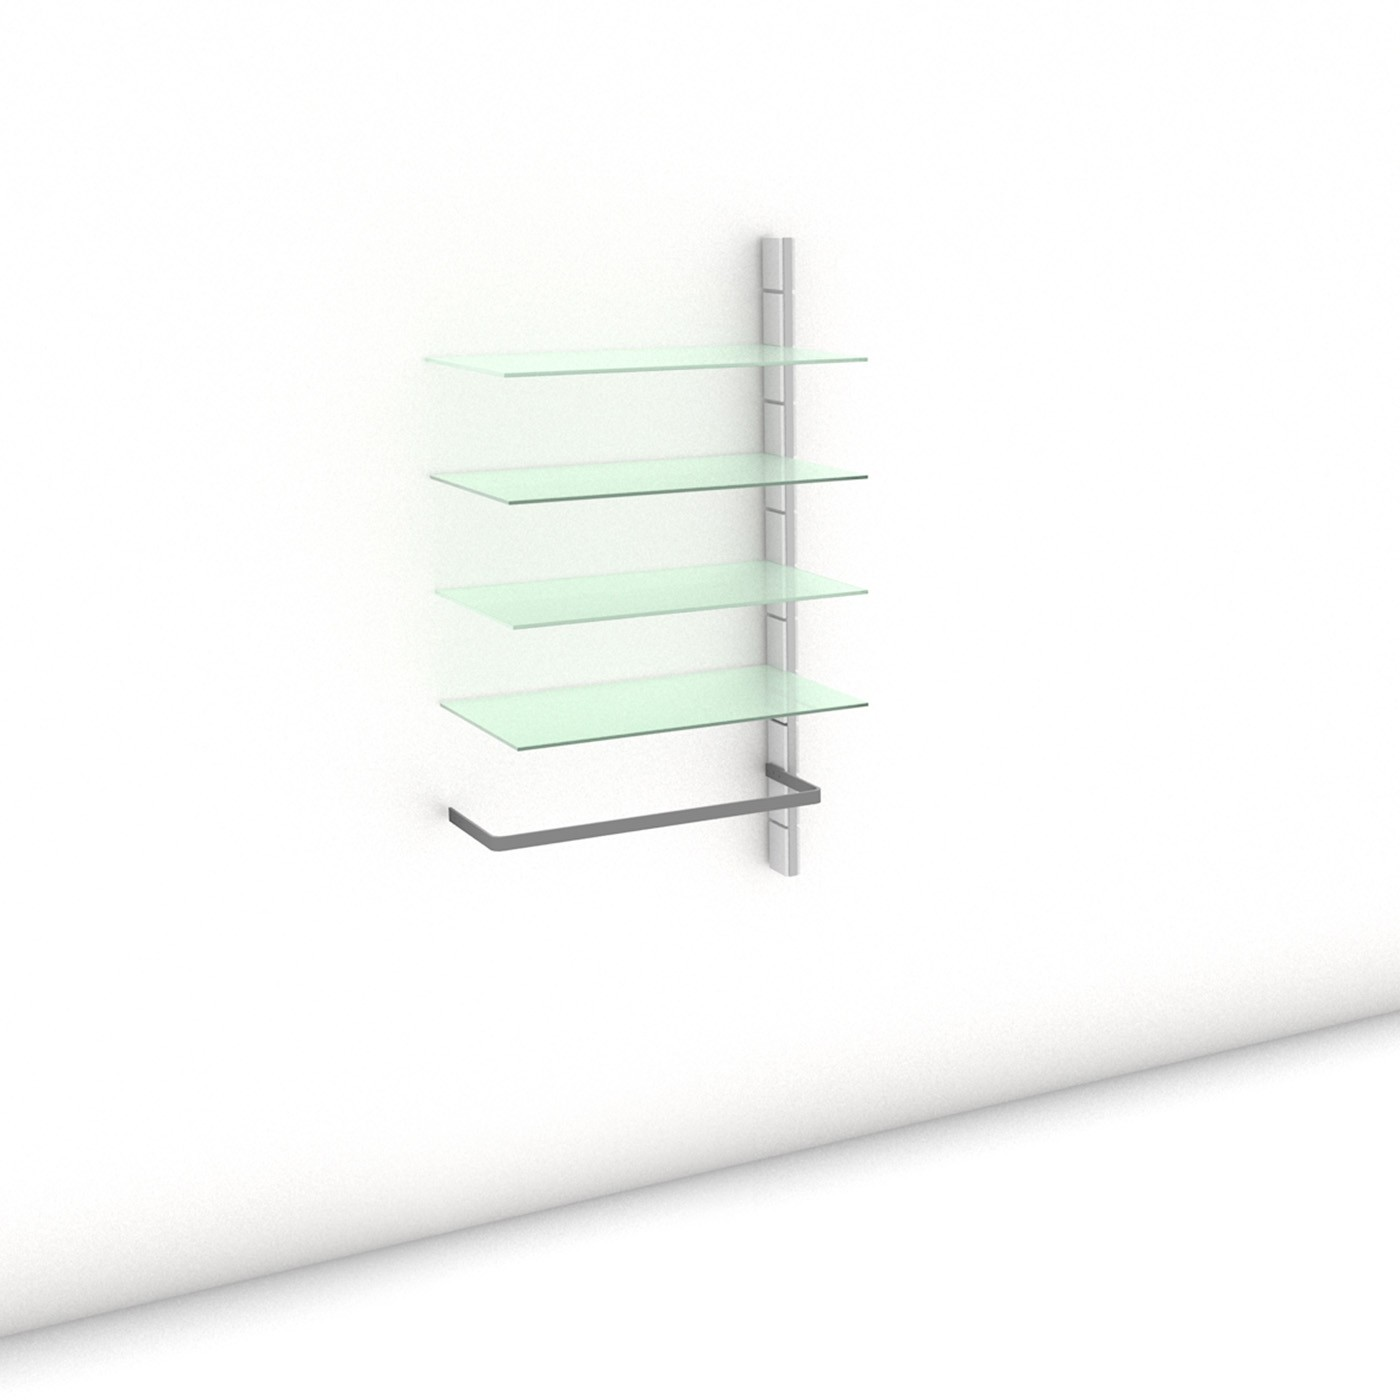 Begehbarer Kleiderschrank - Prime (L) 81 - Anbauelement - Maß: 81 x 143,2 x 45 cm (B x H x T)